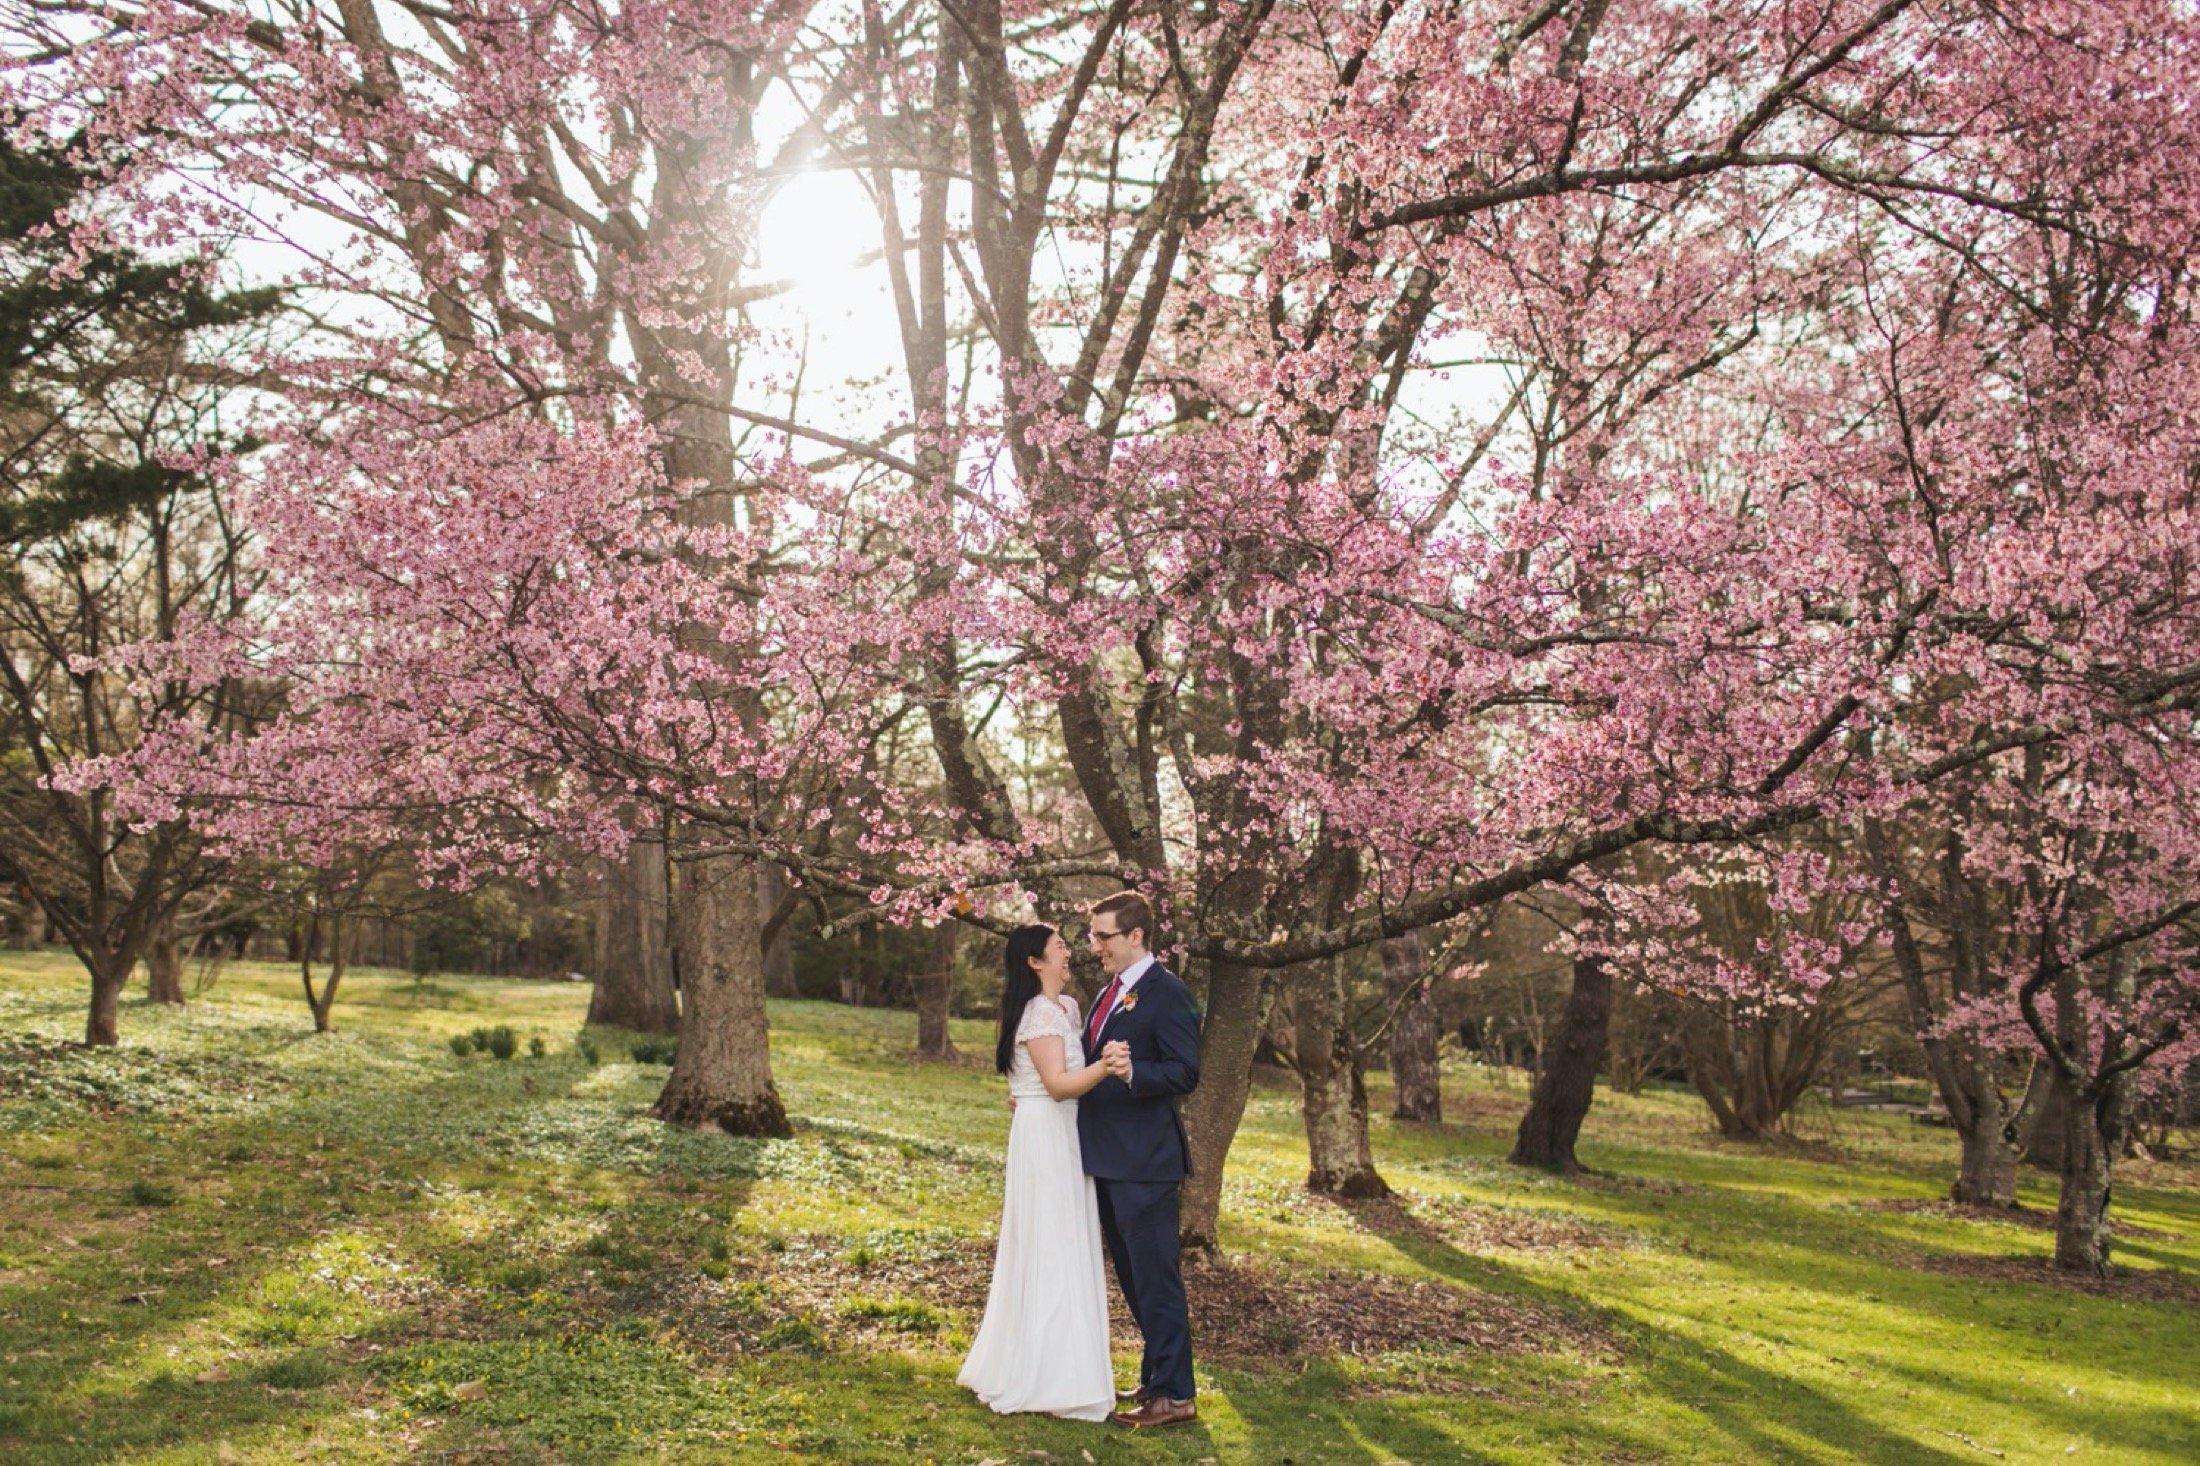 photos from a microwedding at Morris Arboretum in Philadelphia